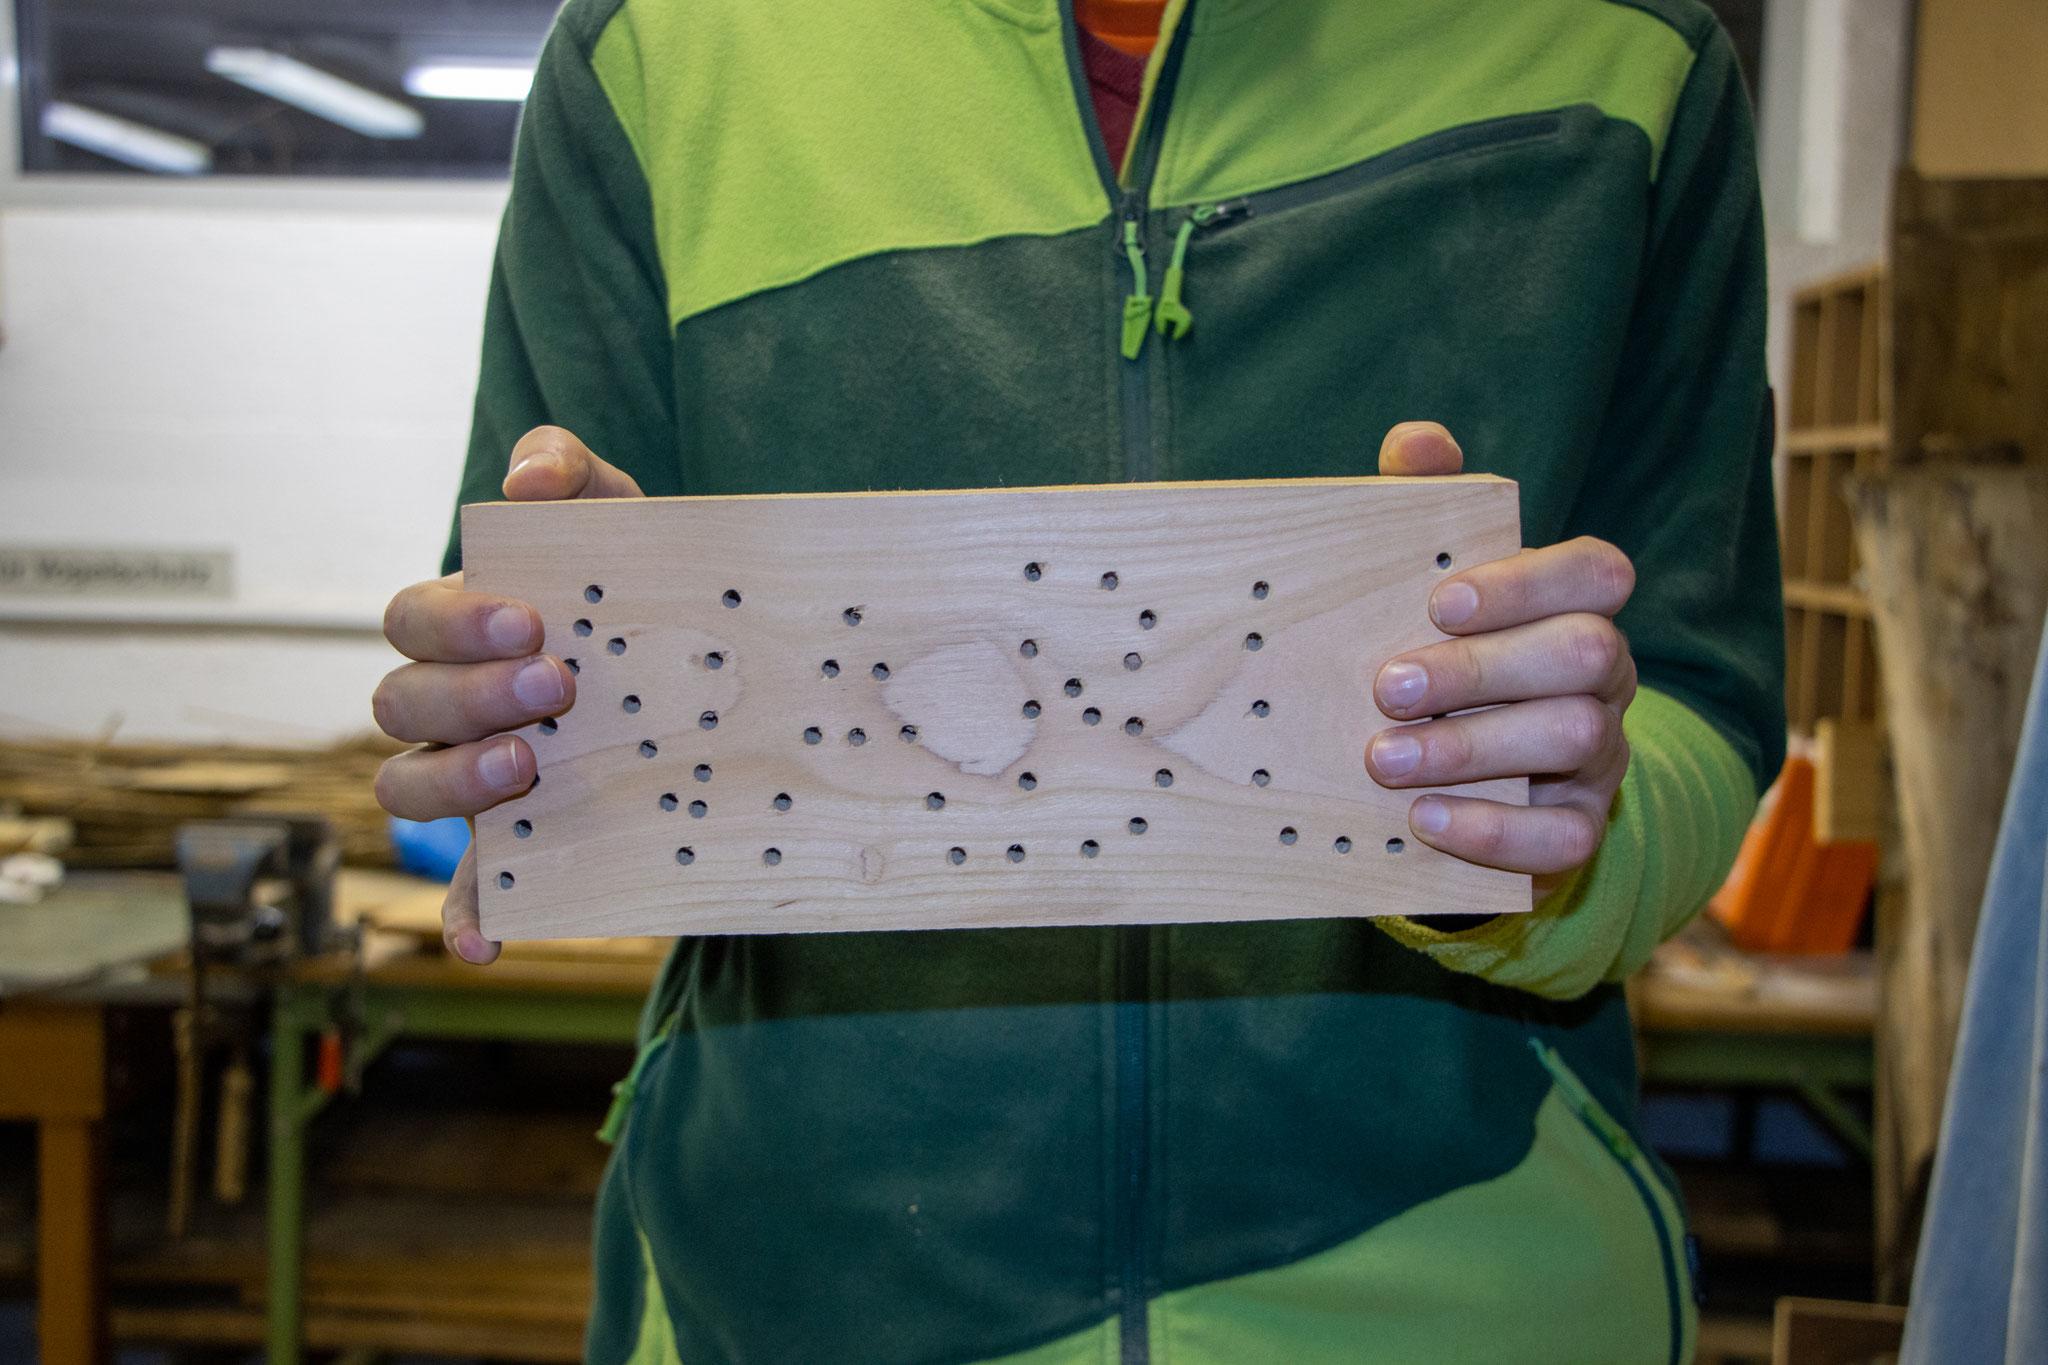 Der Holzblock mit dem NABU-Schriftzug (Foto: B. Budi)